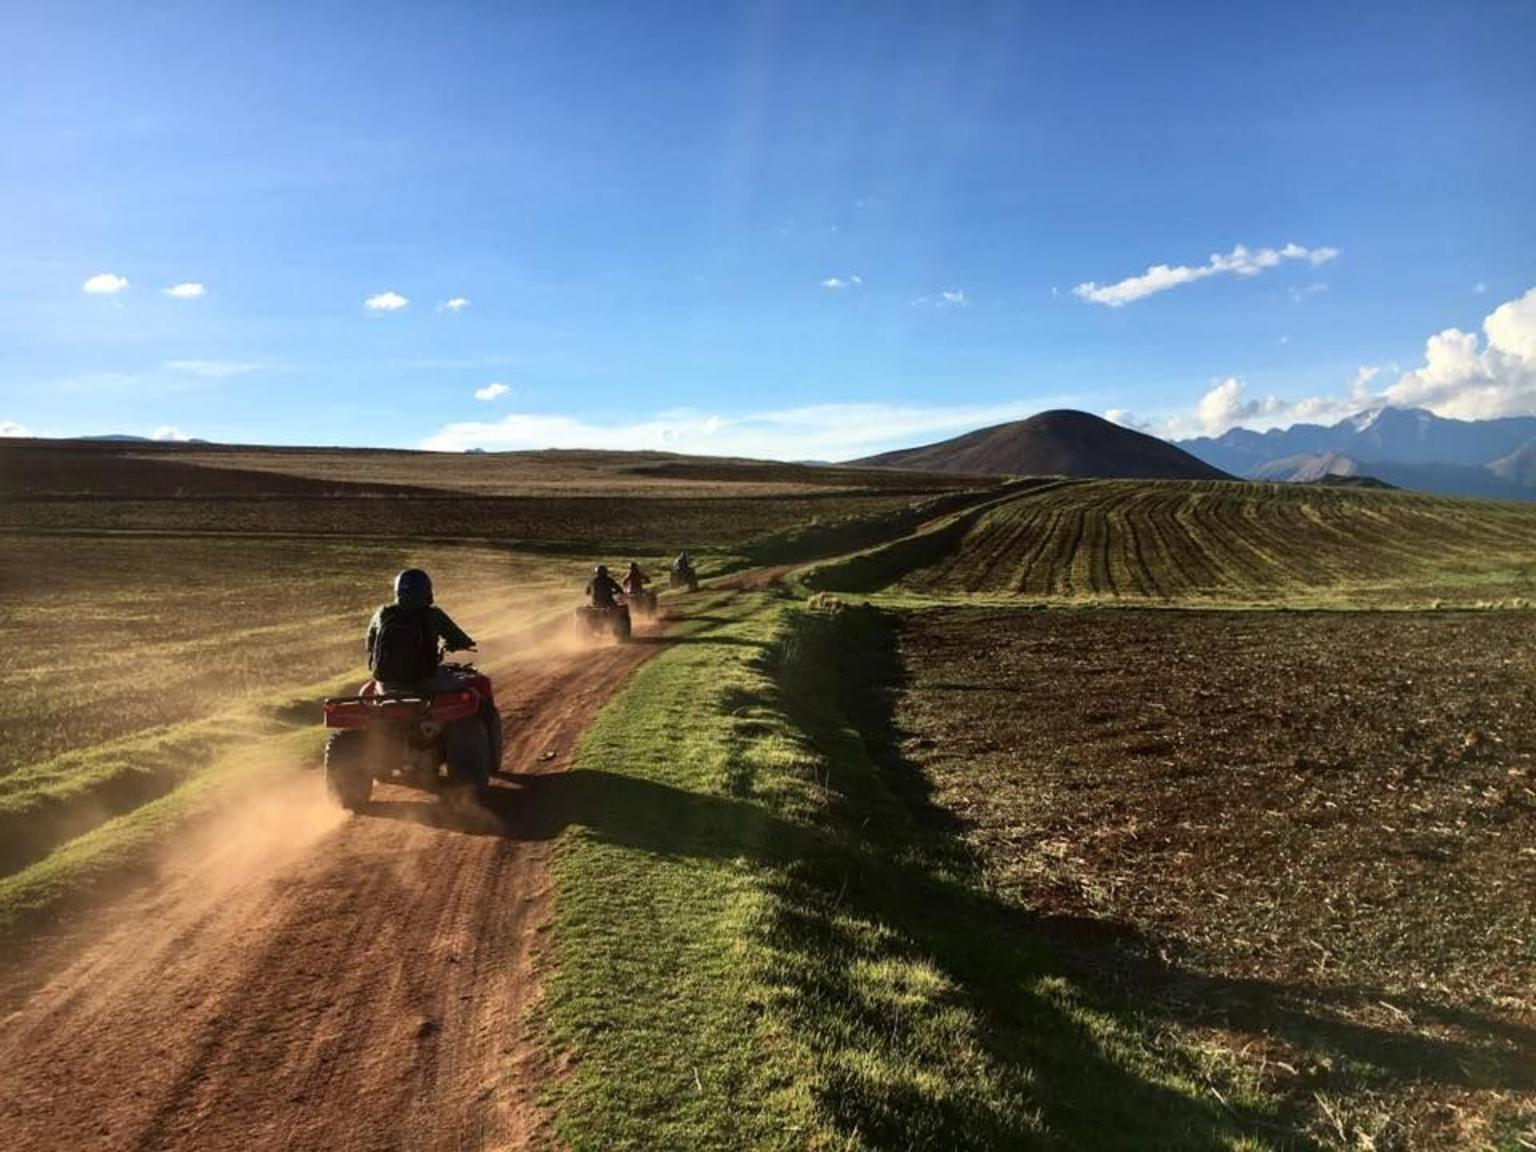 MORE PHOTOS, Sacred Valley 4x4 Quadbike Adventure from Cusco